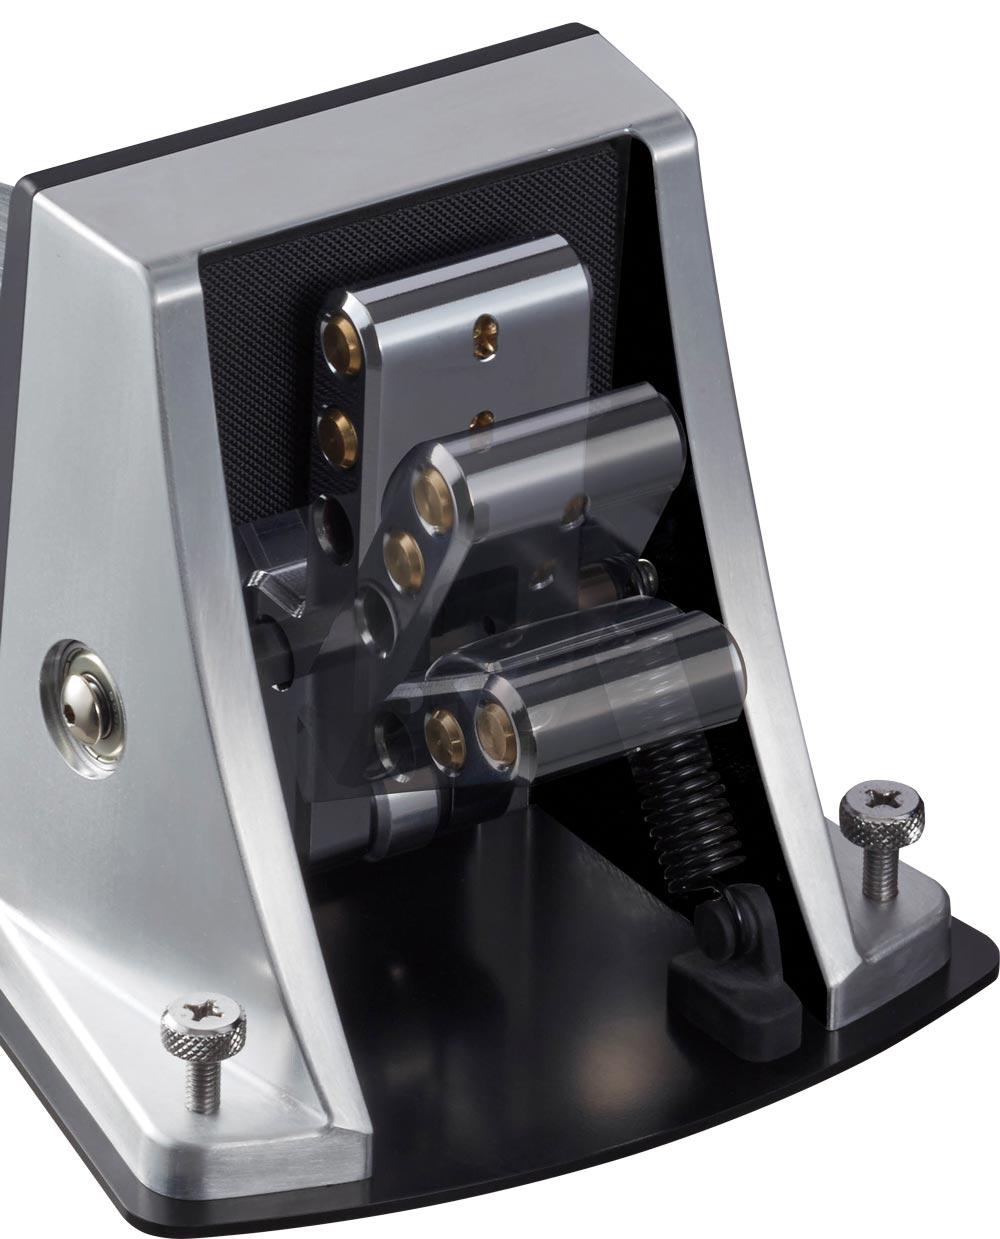 Hybrid Drums KT-10 Beater Detail